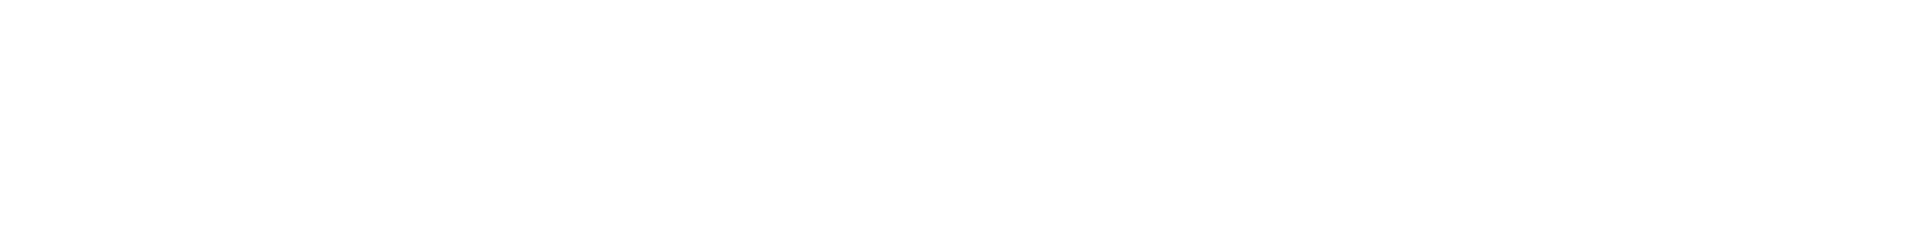 shape pelamin